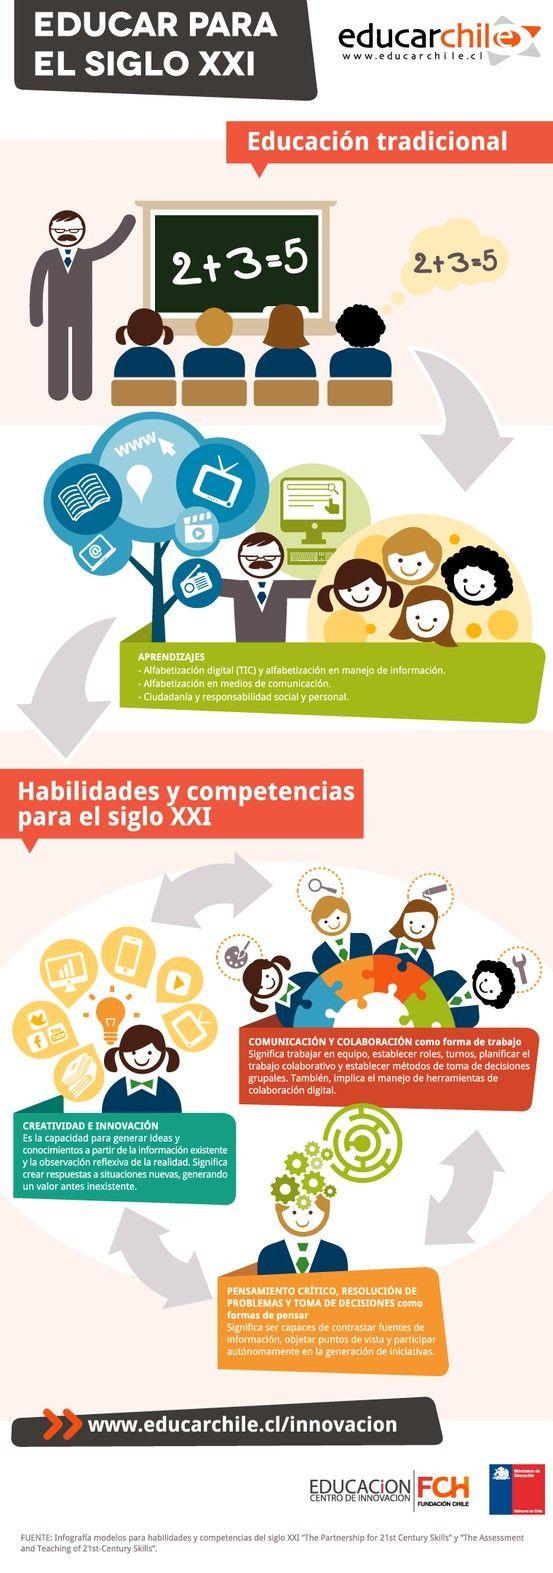 Habilidadescompetenciaseducativassigloxxi Infografc3ada Bloggesvin Jpg 553 1573 Educacion Tradicional Competencias Educativas Educacion